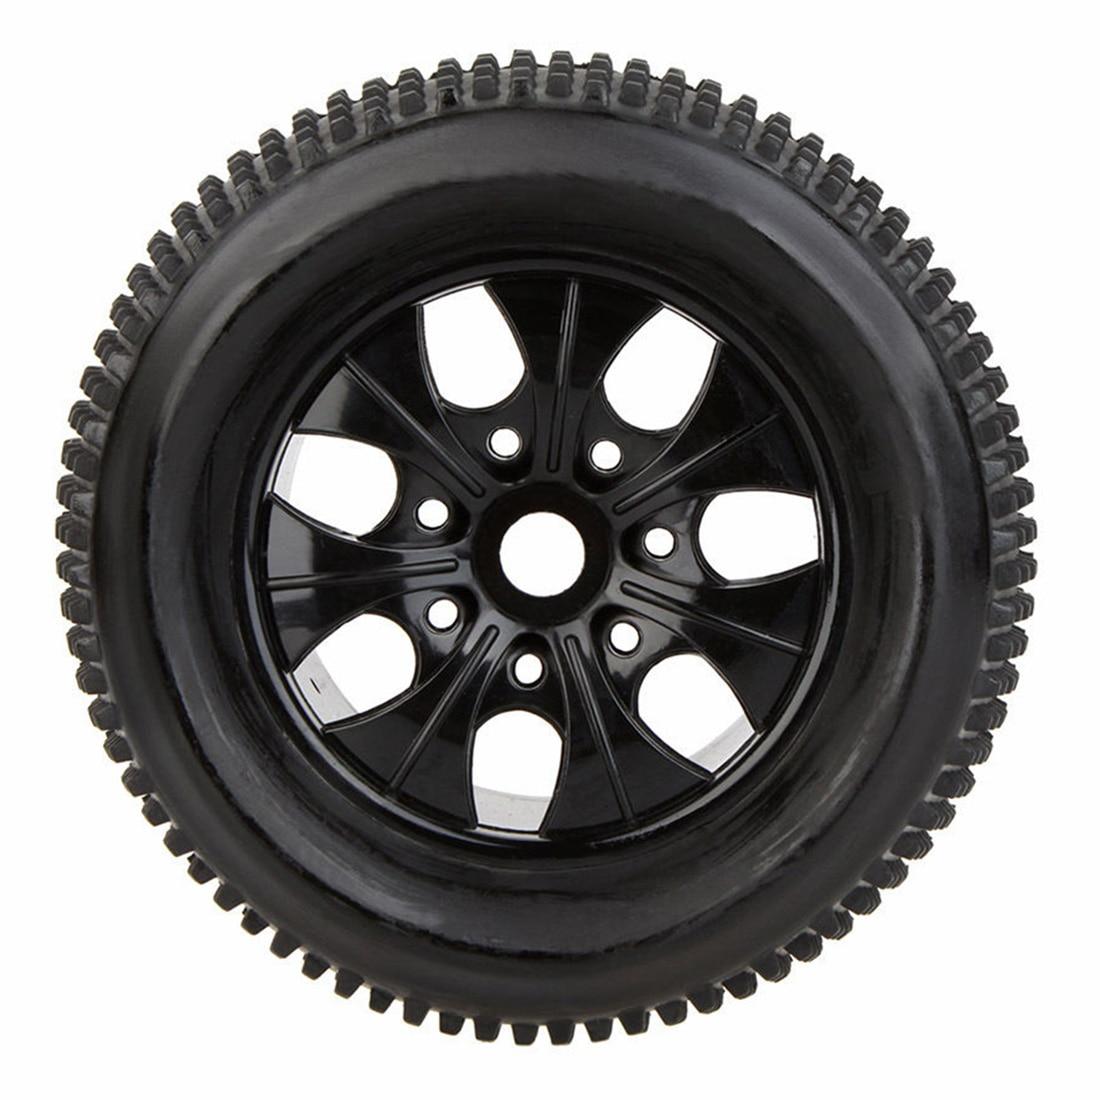 2Pcs RC 1/8 Truck Car Wheel Rim and Tire 810011 fr Traxxas HSP Tamiya HPI RC Car